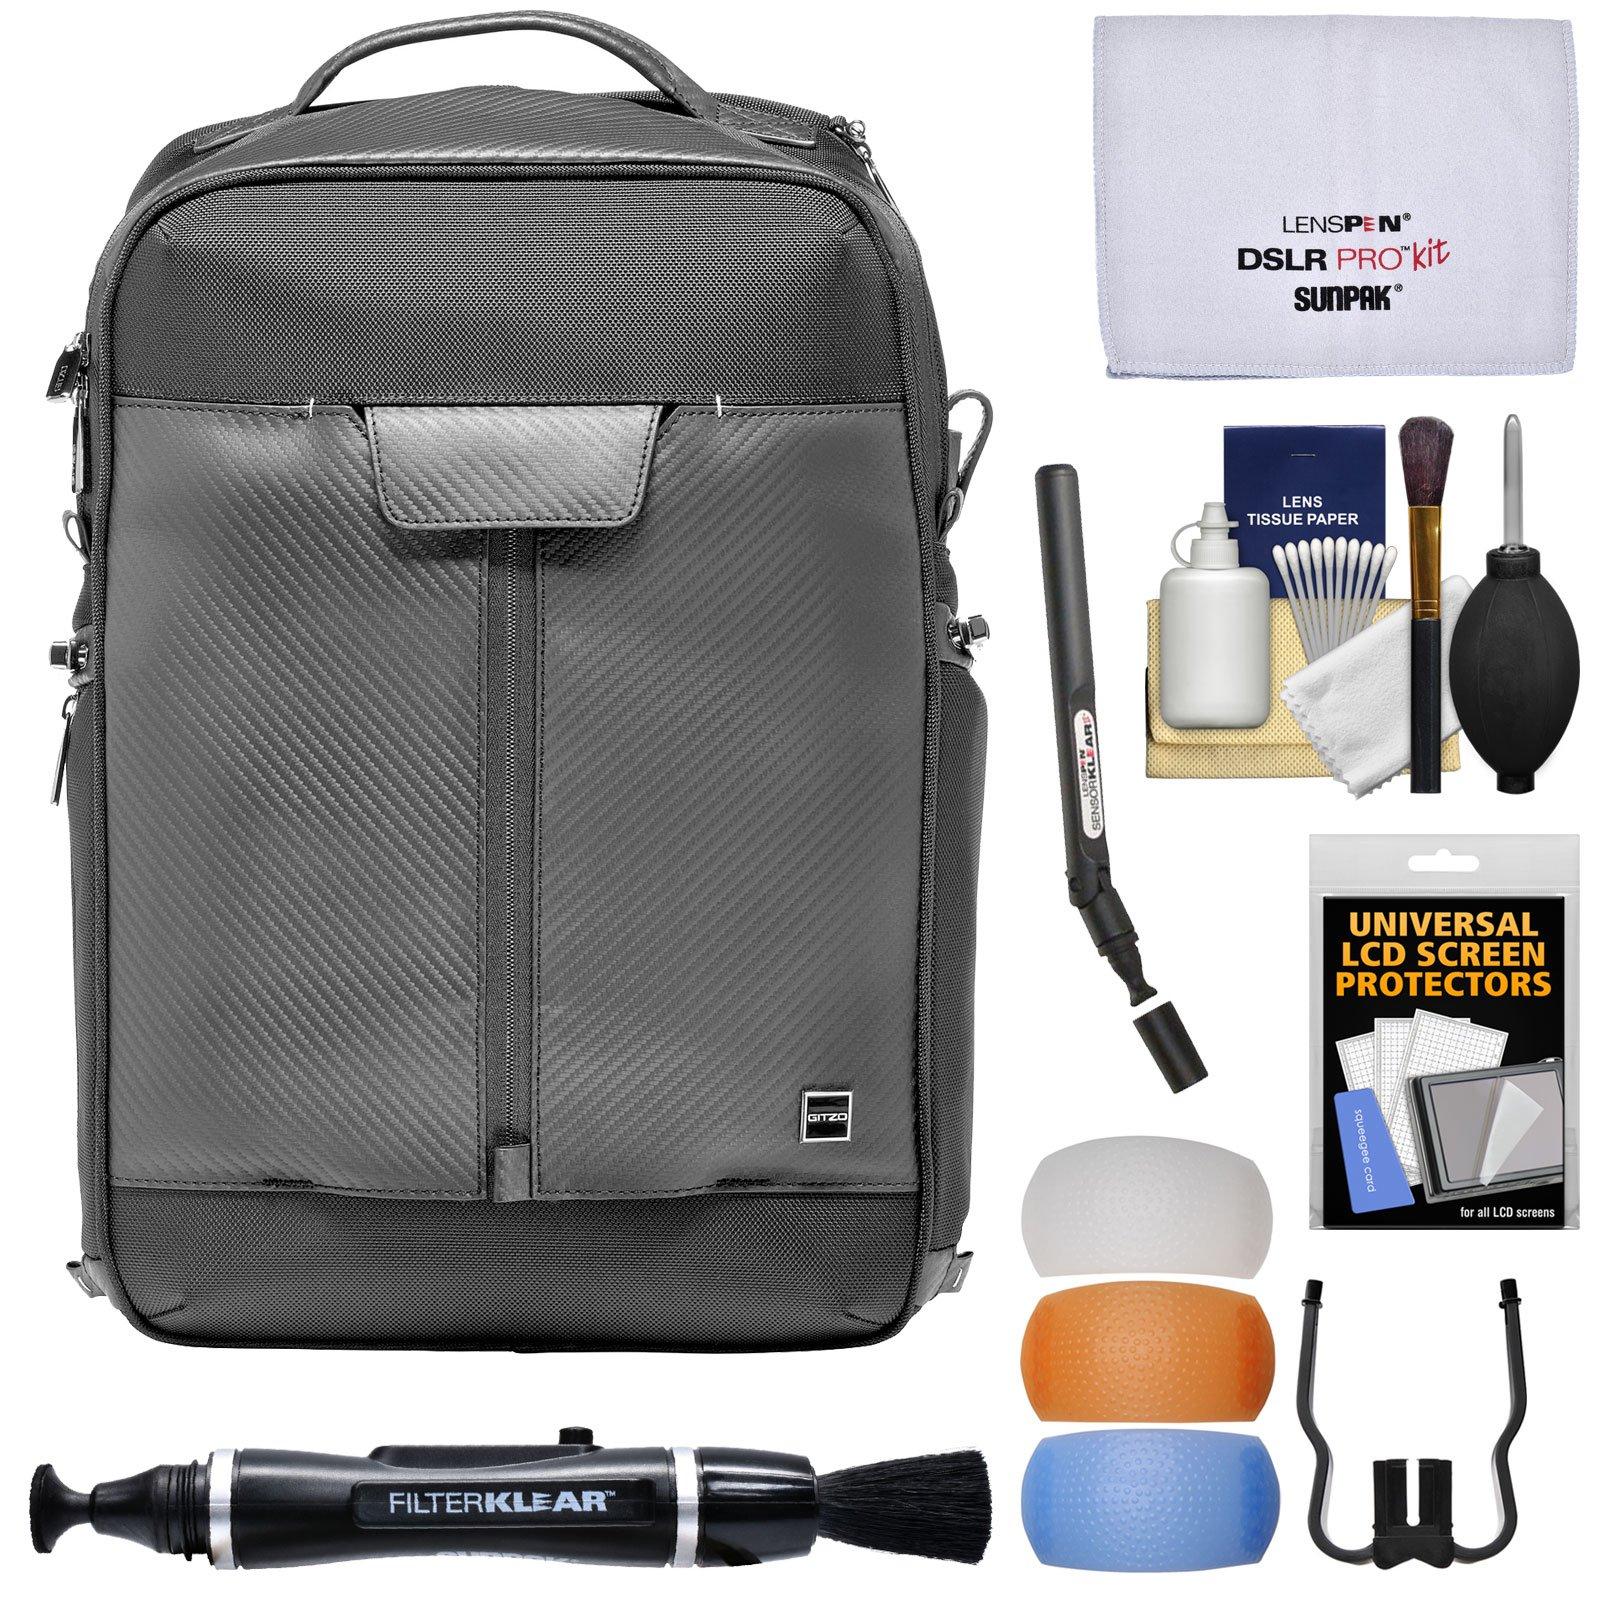 Gitzo Century Traveler Digital SLR Camera Backpack with Flash Diffuser Set + Lens & Sensor Cleaning Pens + Kit by Gitzo (Image #1)